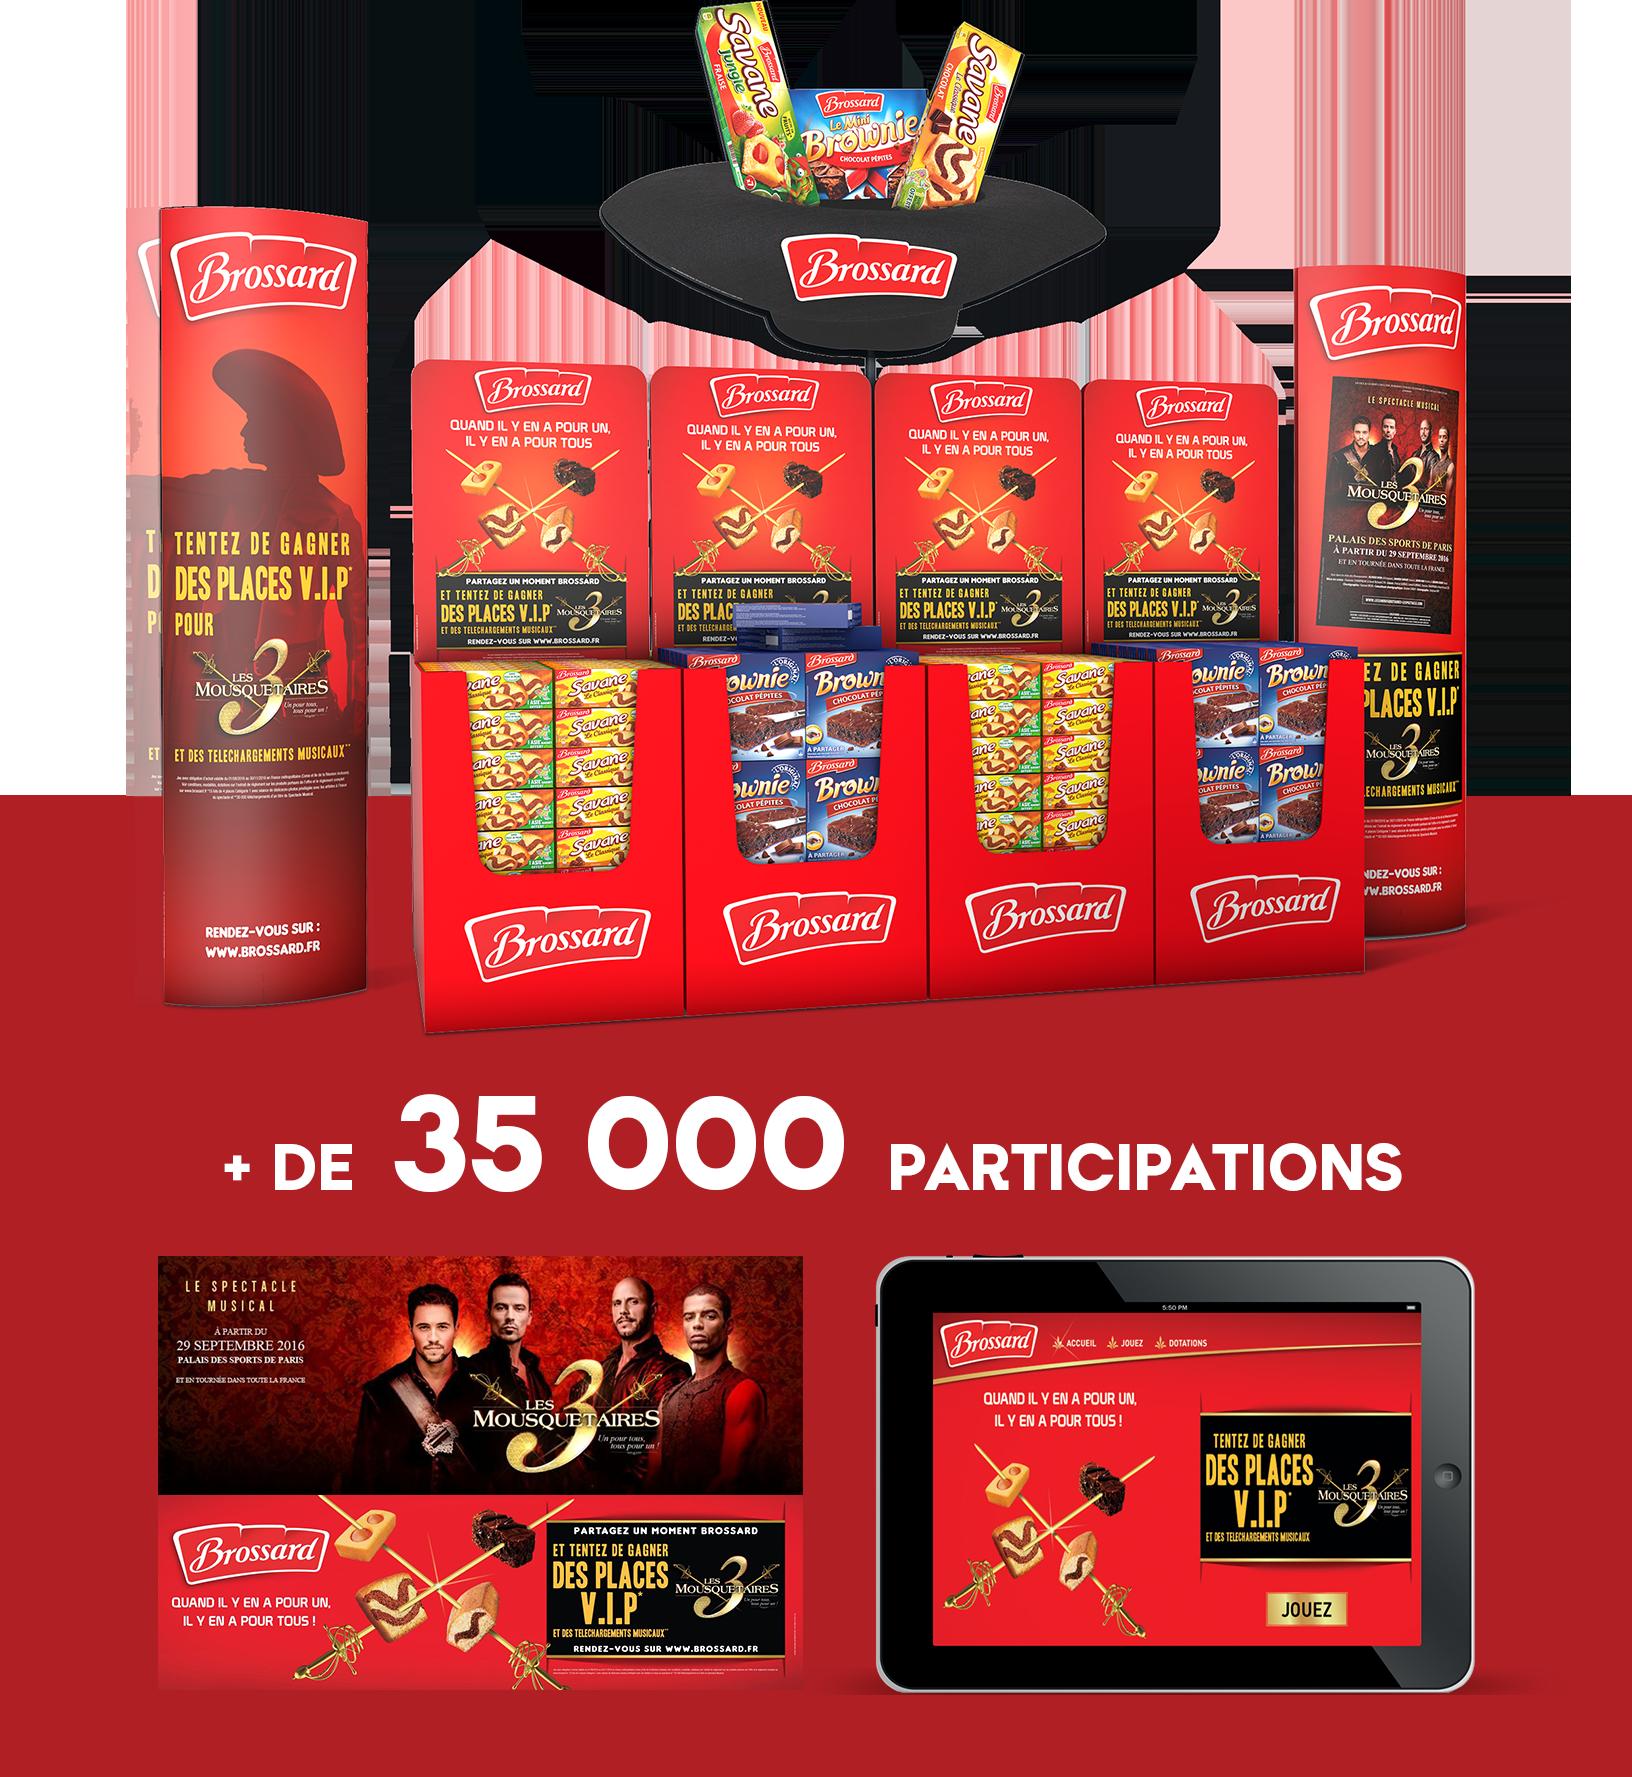 Agence communication Rangoon - shopper marketing home marketing Jacquet Brossard Savane Brownie licencing Les 3 Mousquetaires